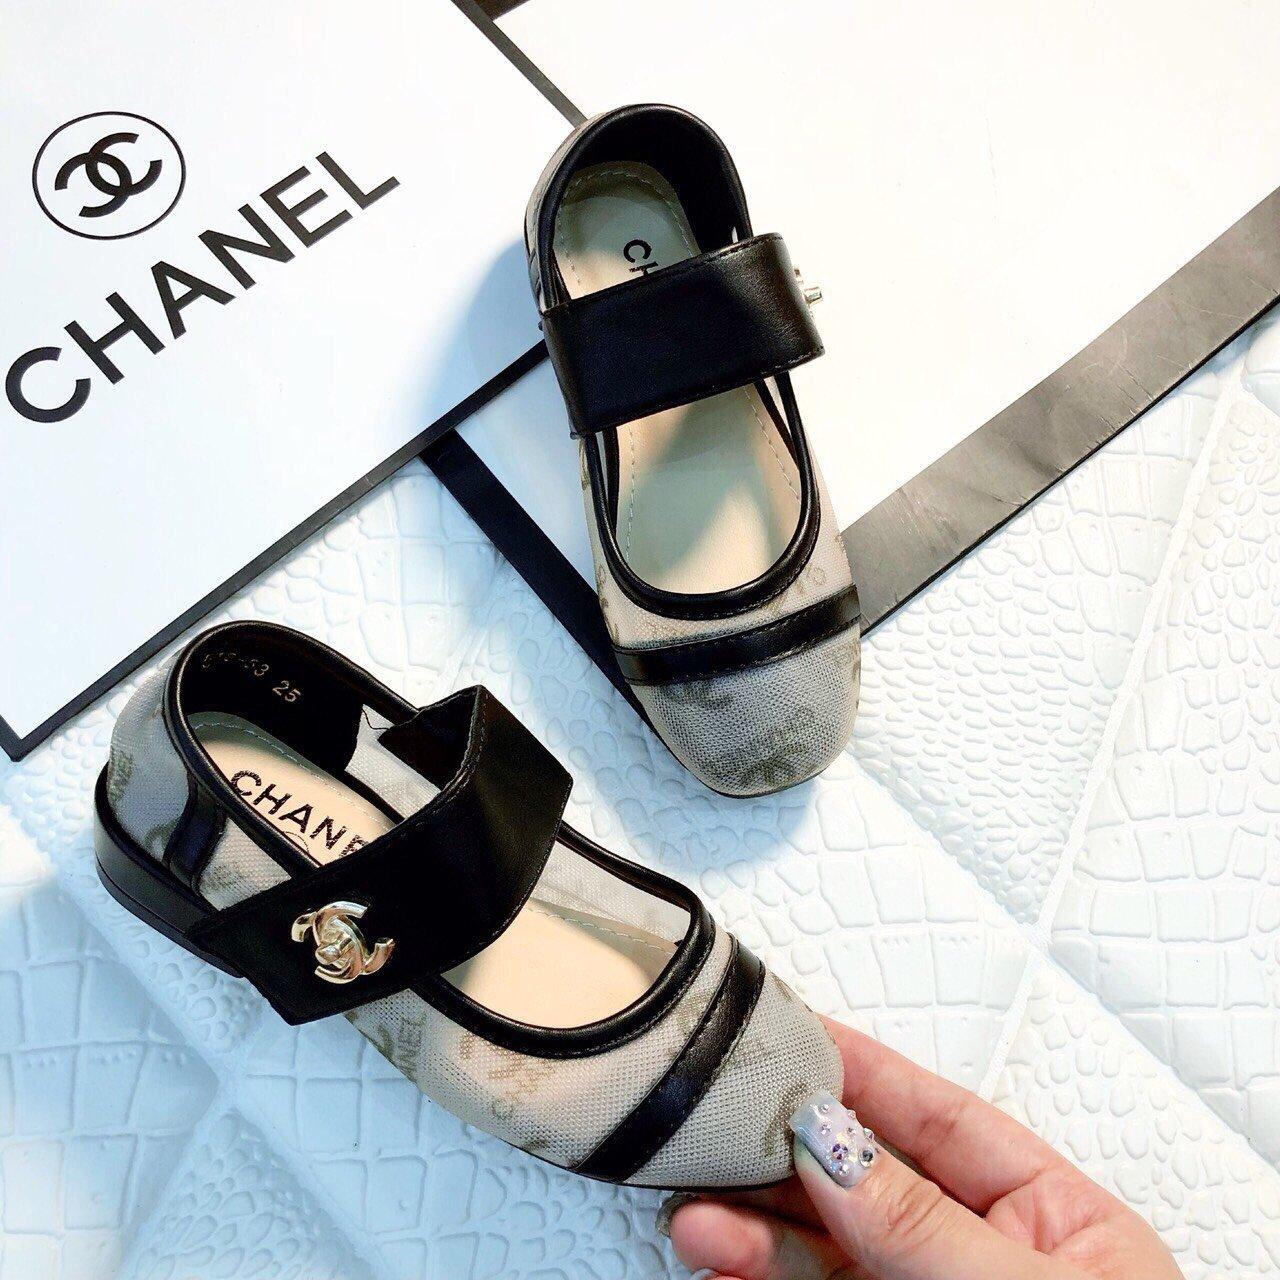 Giày gót bít mũi Chanel